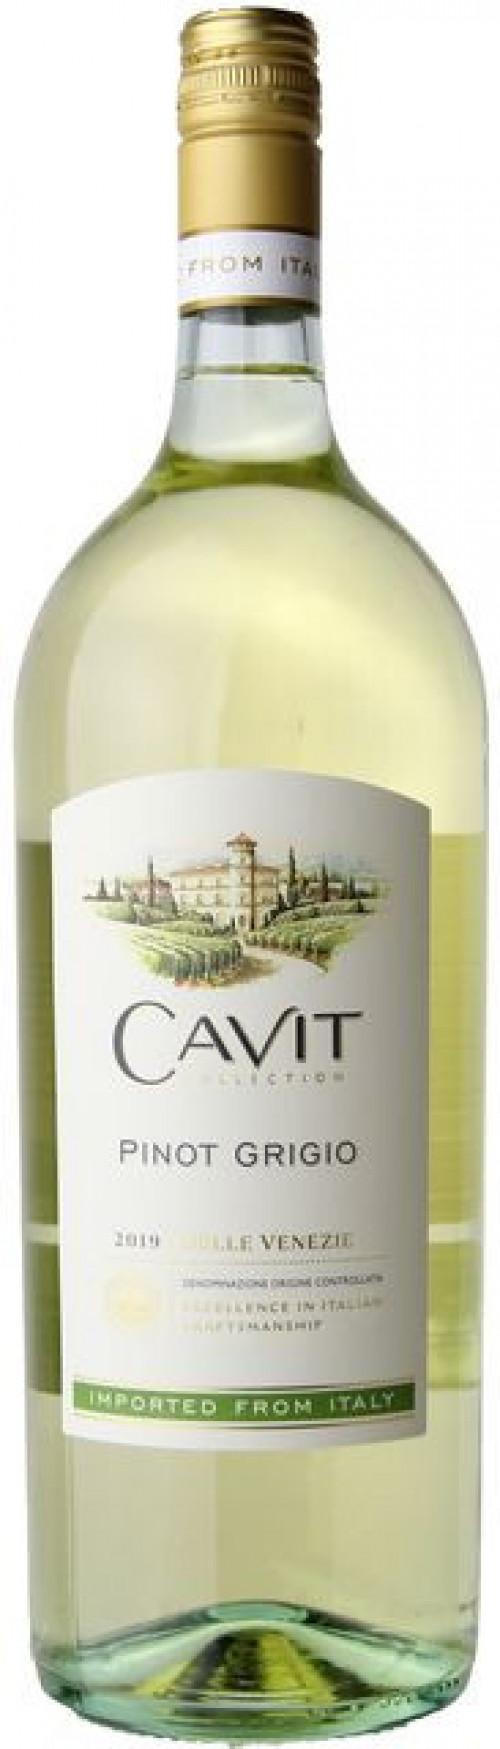 Cavit Pinot Grigio 1.5 Ltr